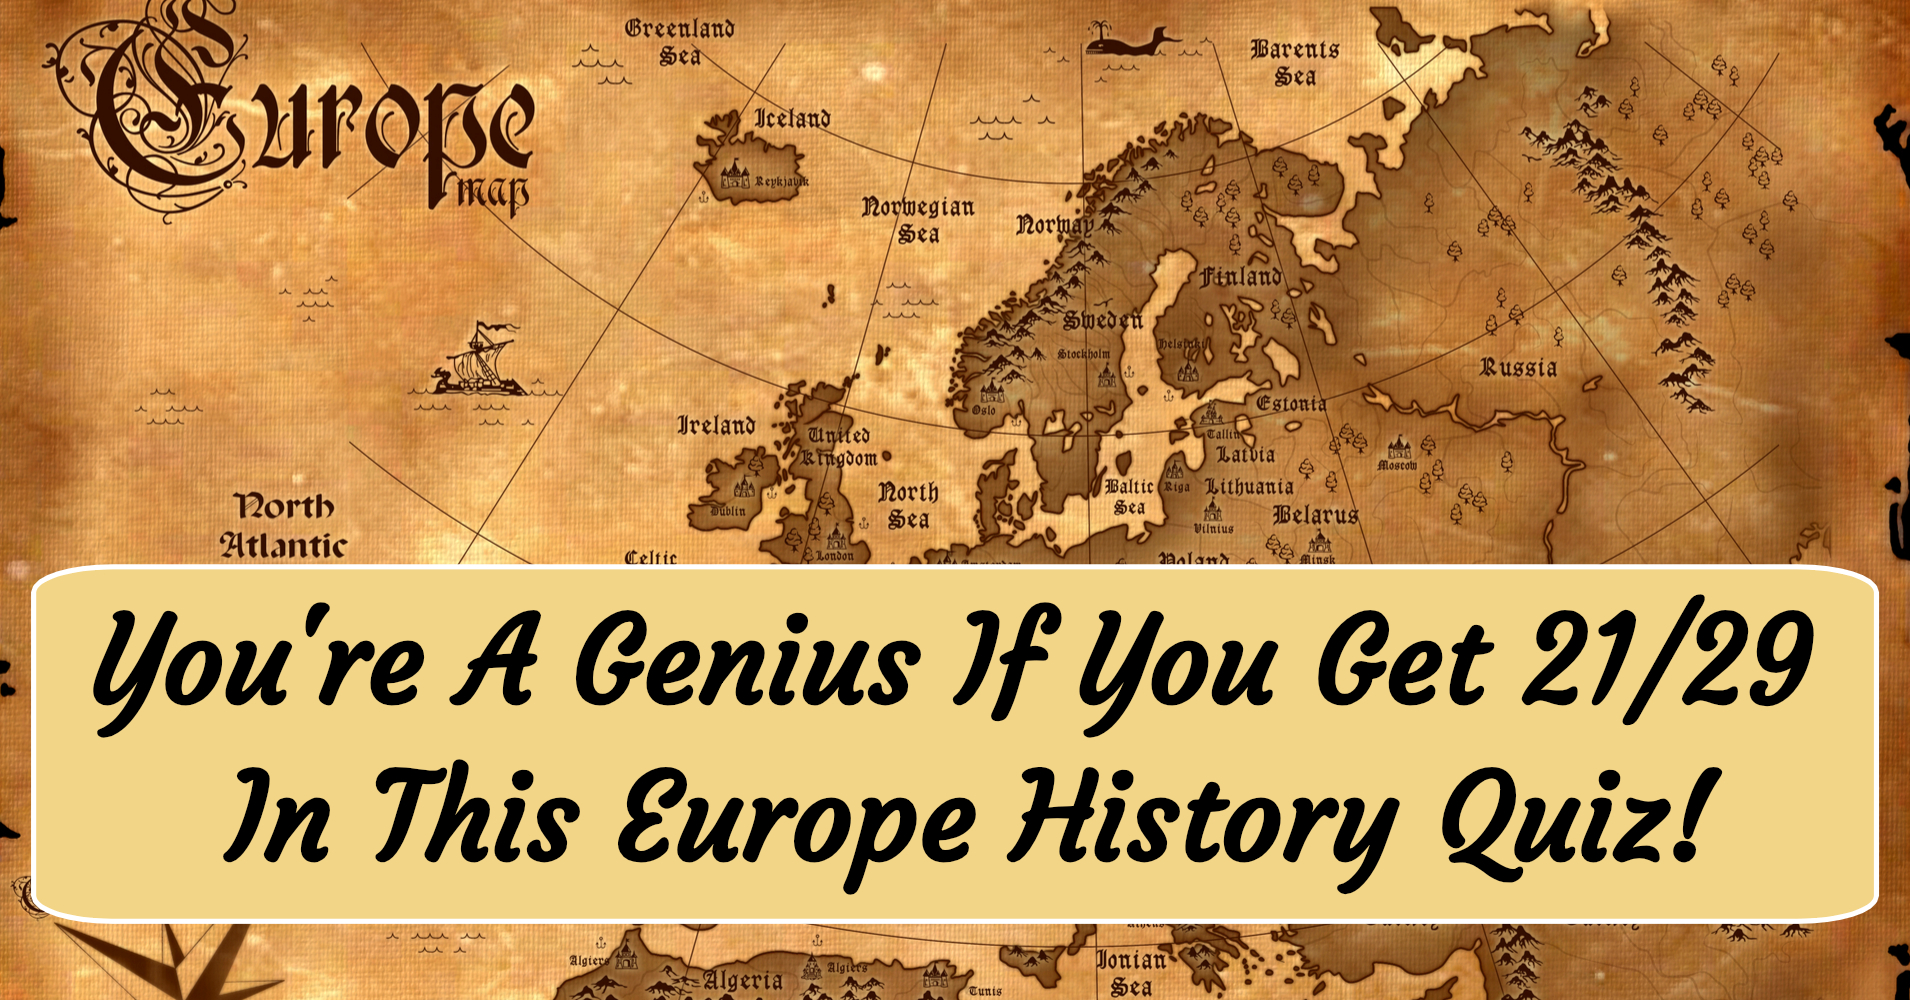 European History Quiz